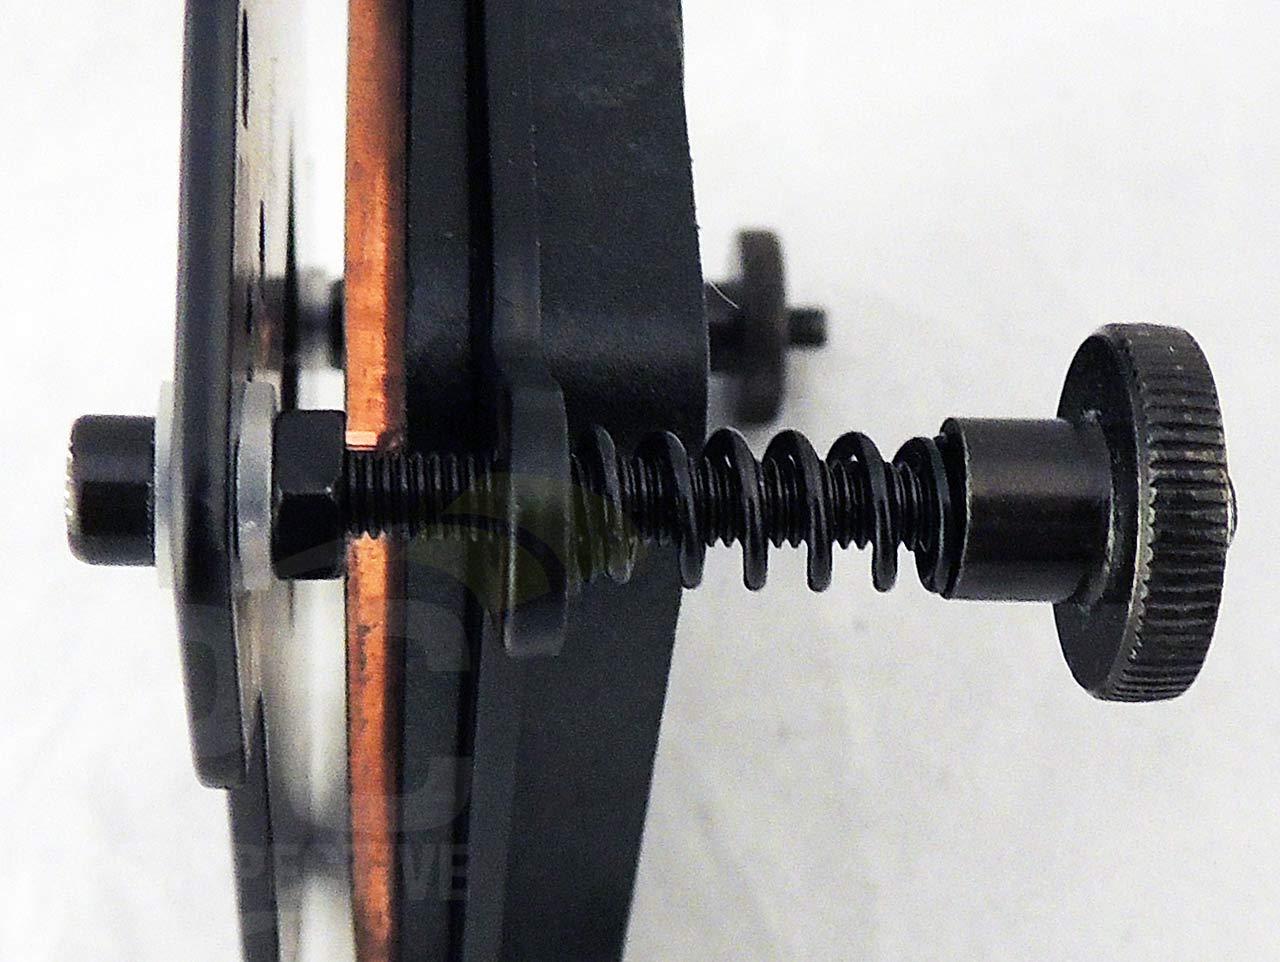 08-block-mount-upright-closeup.jpg